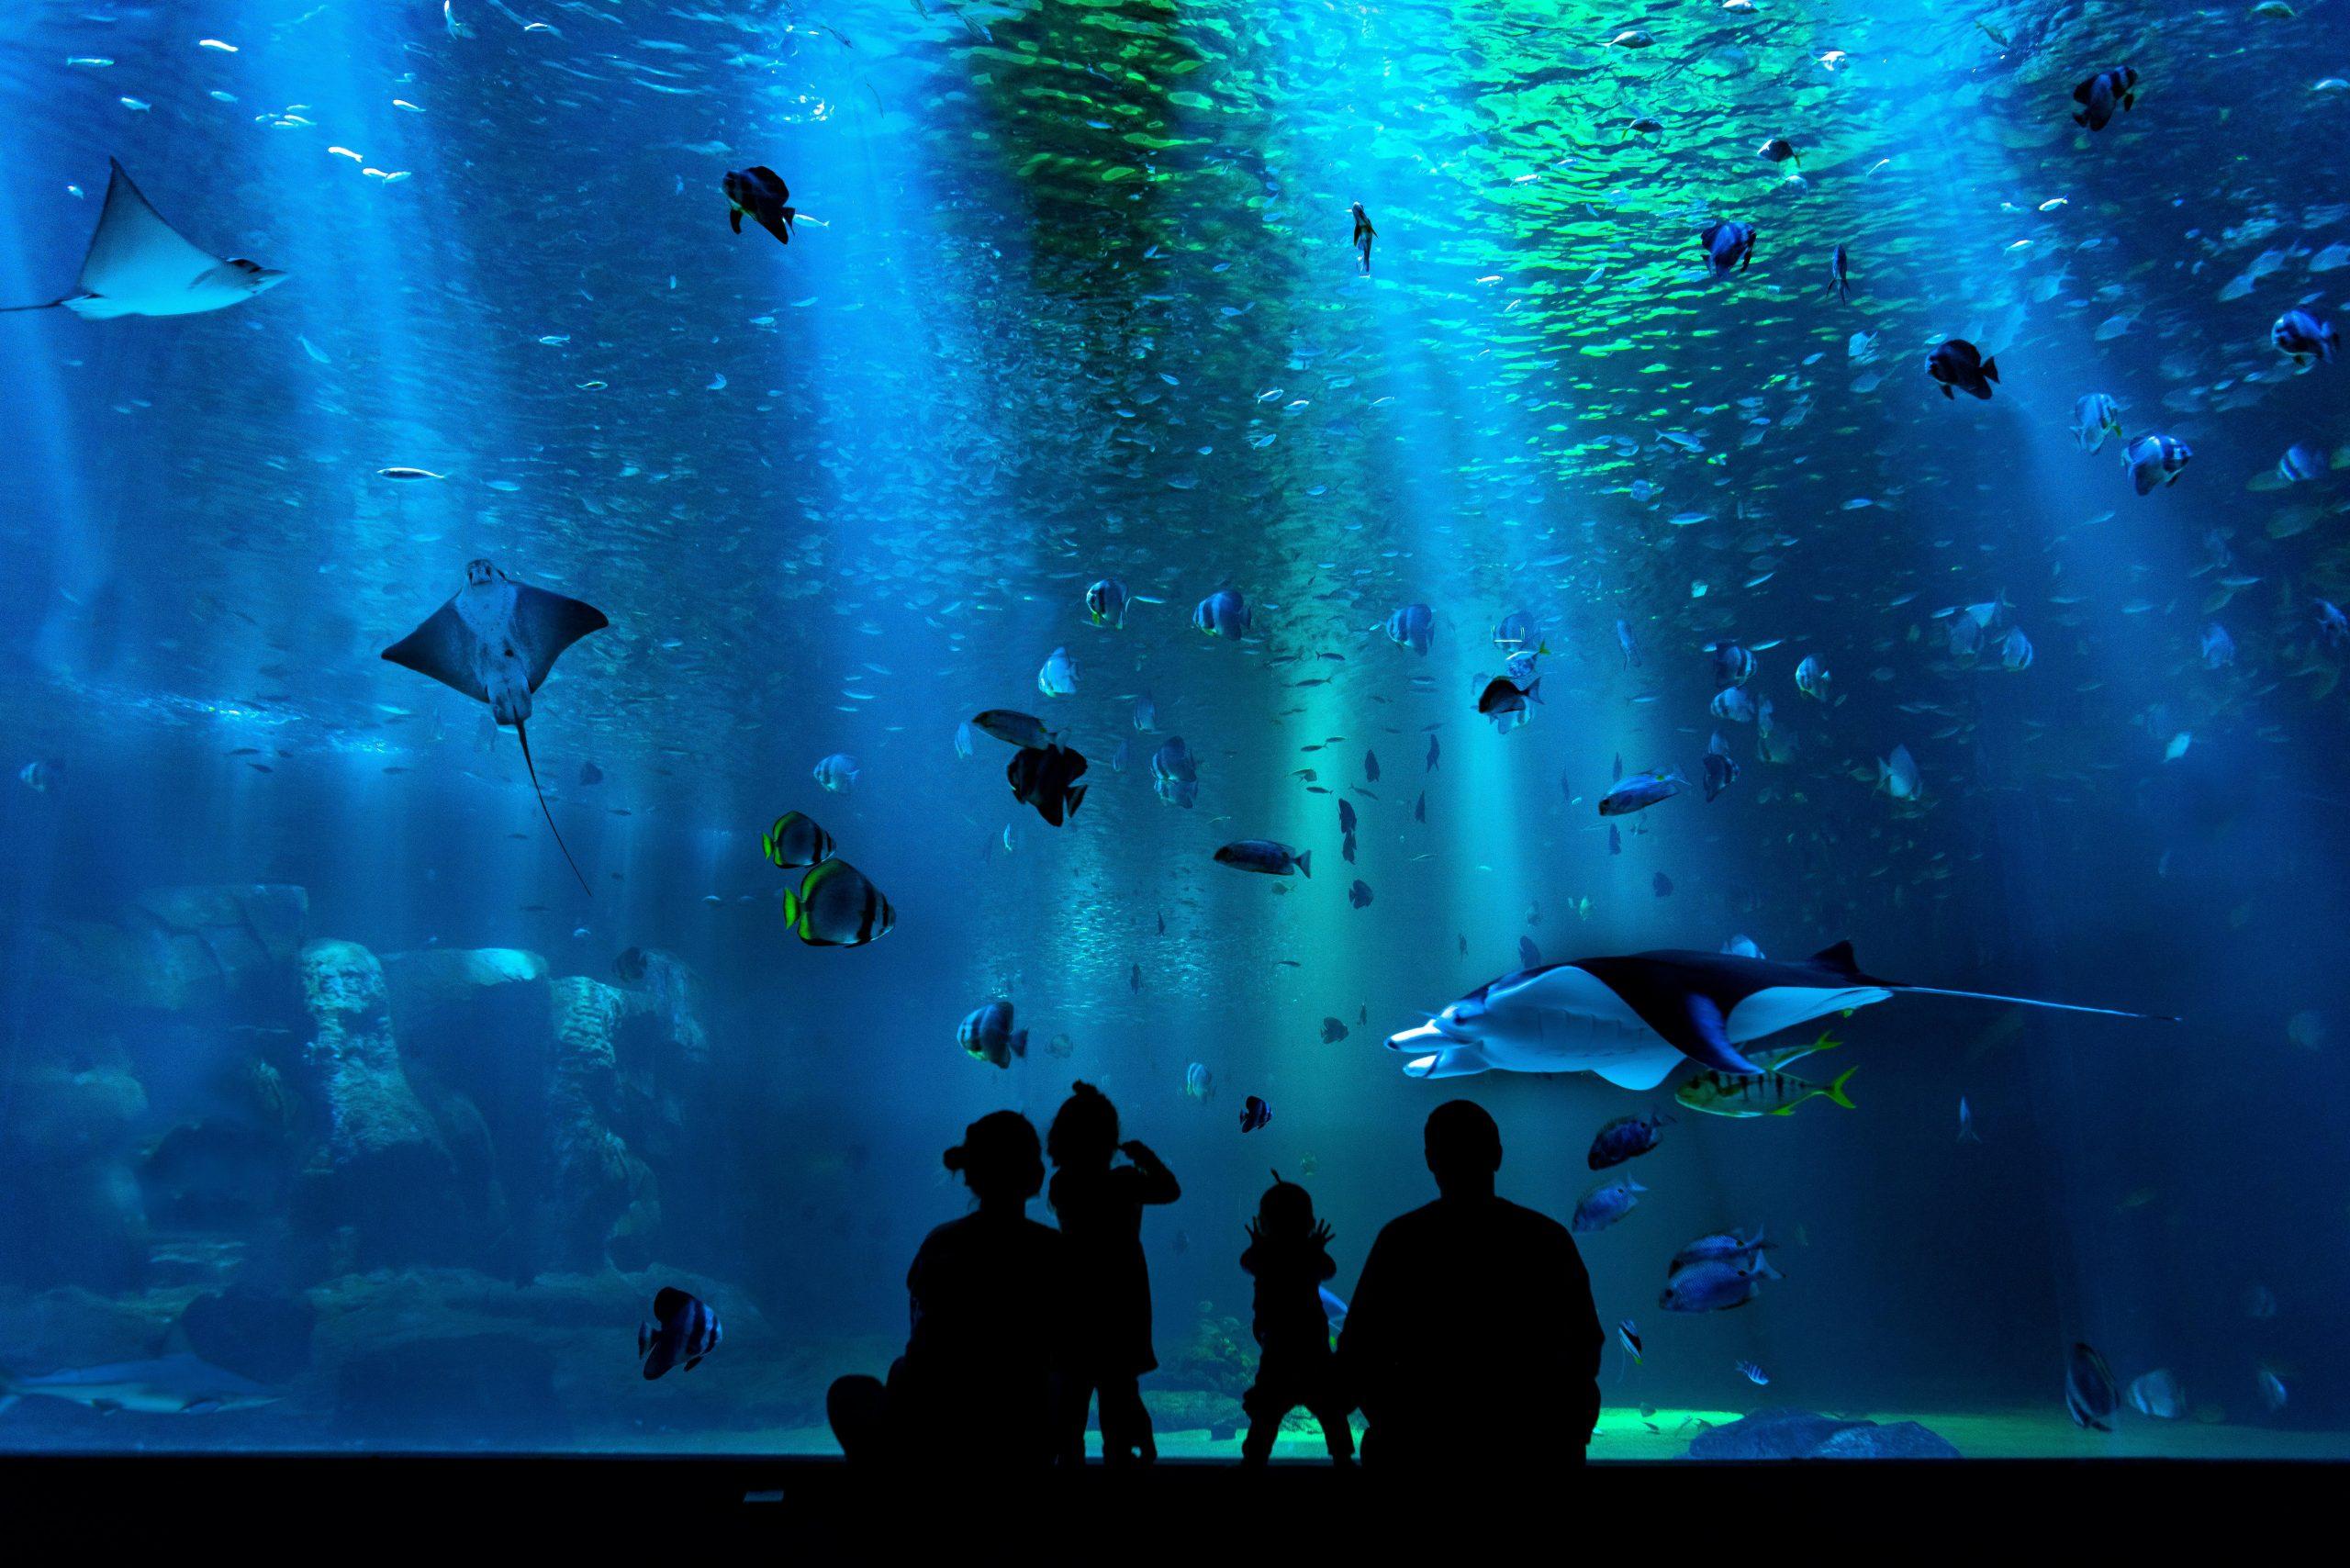 family in the oceanografic